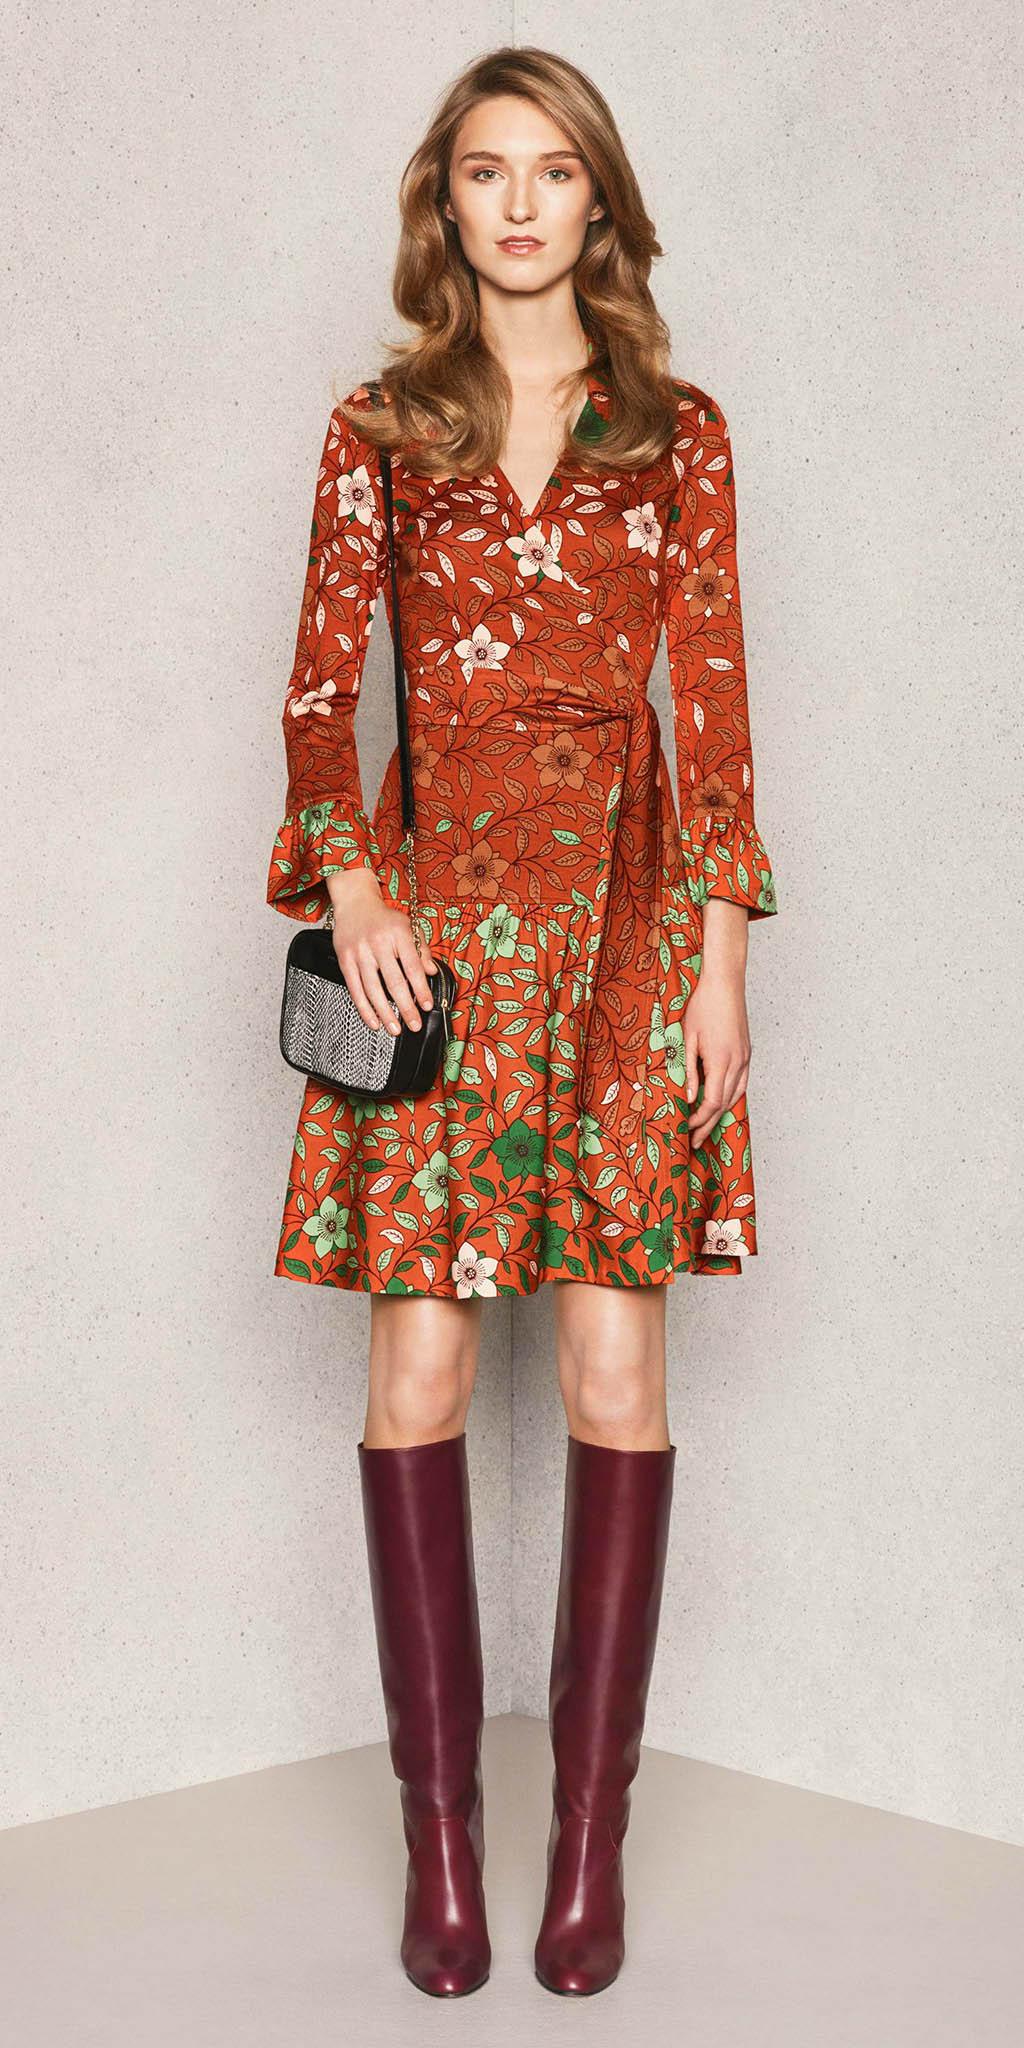 orange-dress-wrap-print-burgundy-shoe-boots-hairr-fall-winter-lunch.jpg